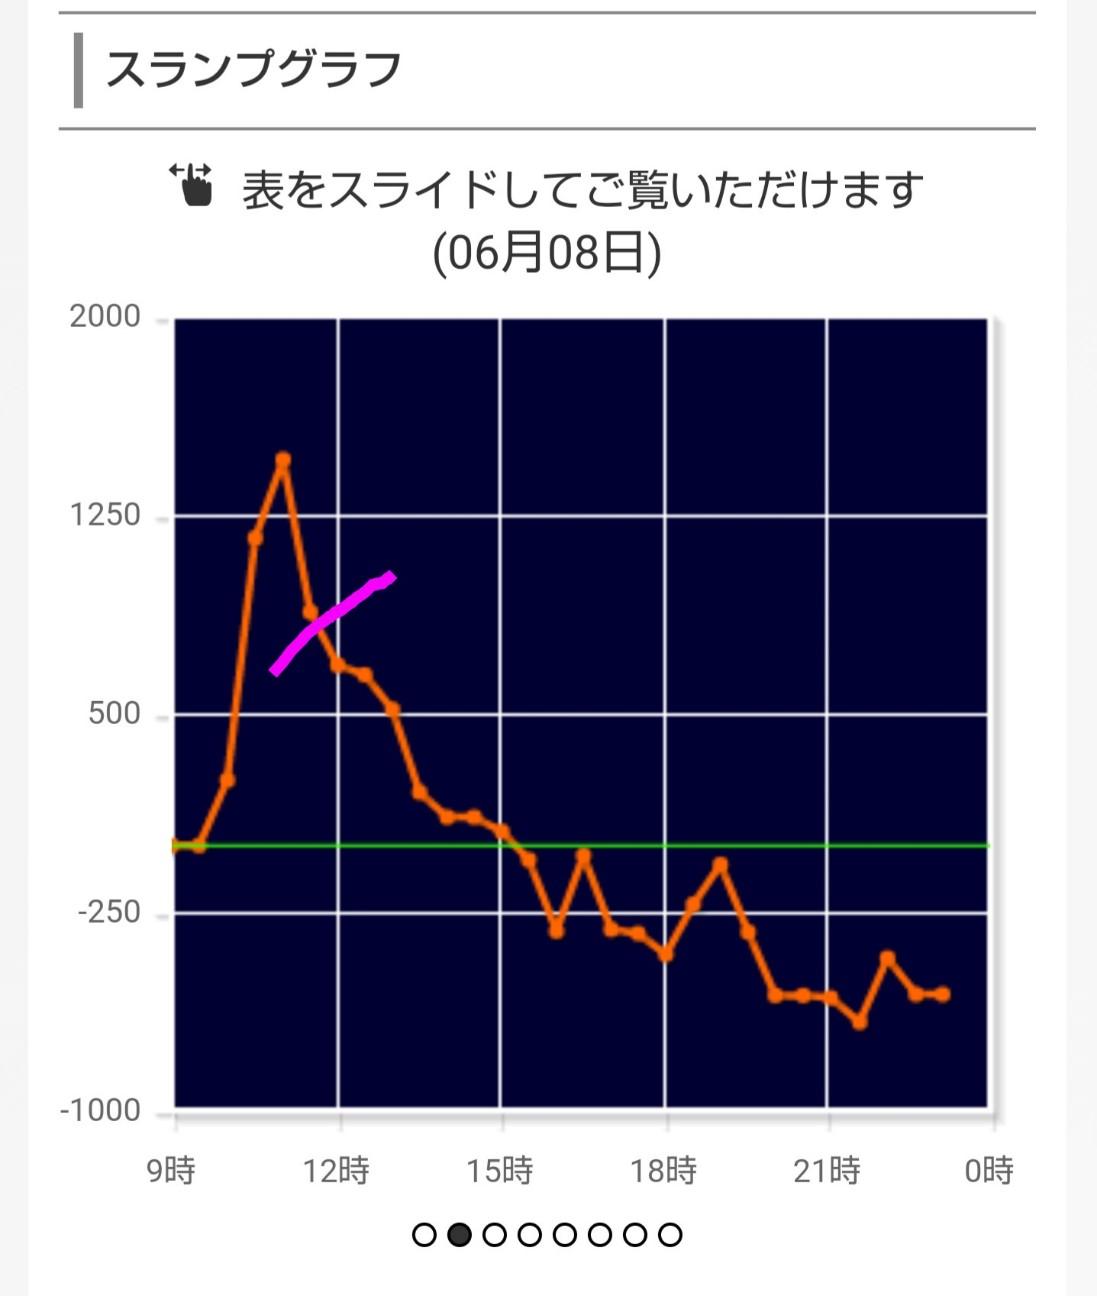 f:id:nagikoro:20190610022352j:plain